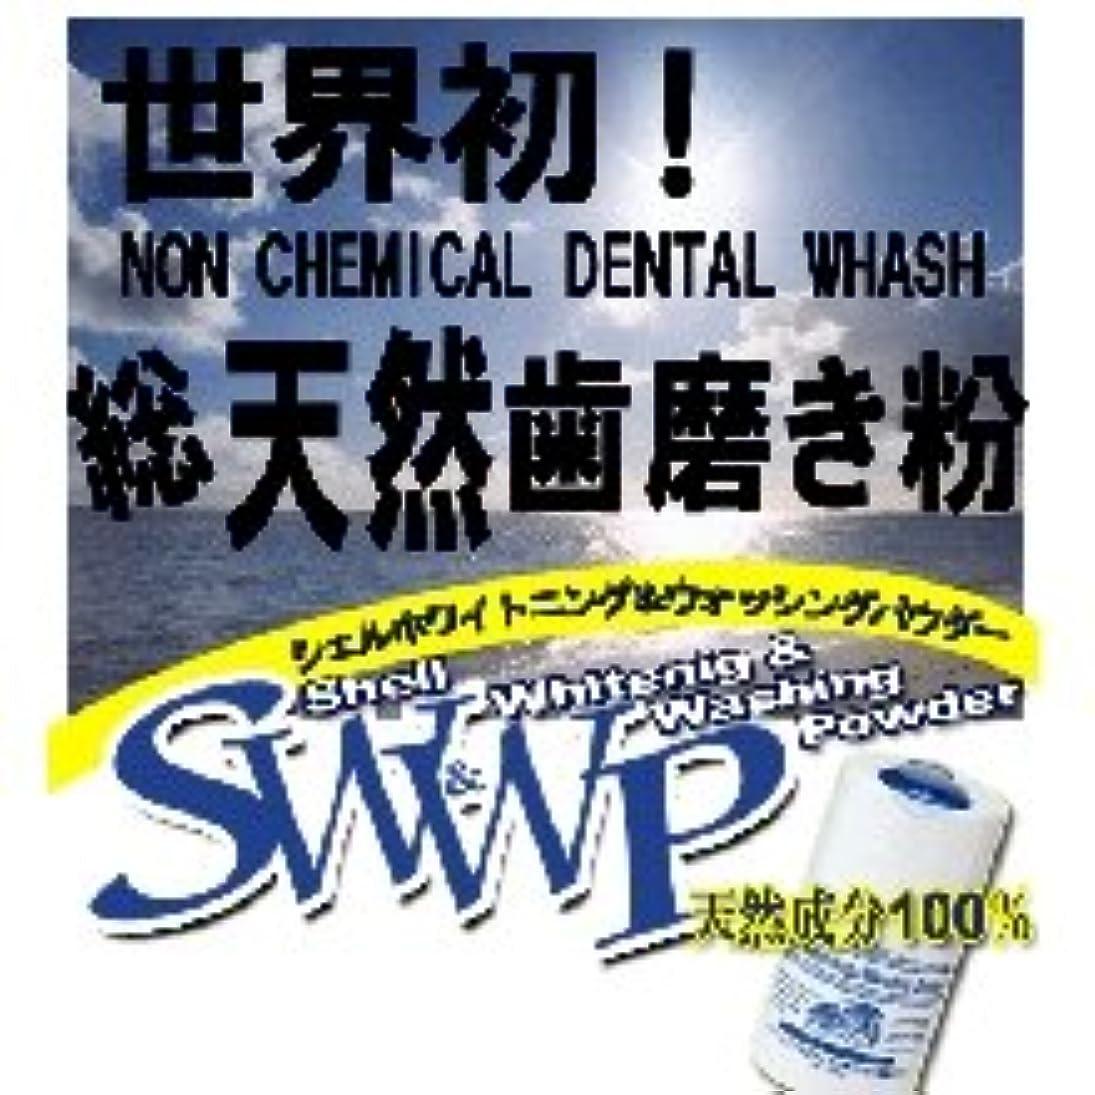 Shell Whitening & Whashing Powder シェルホワイトニングパウダー